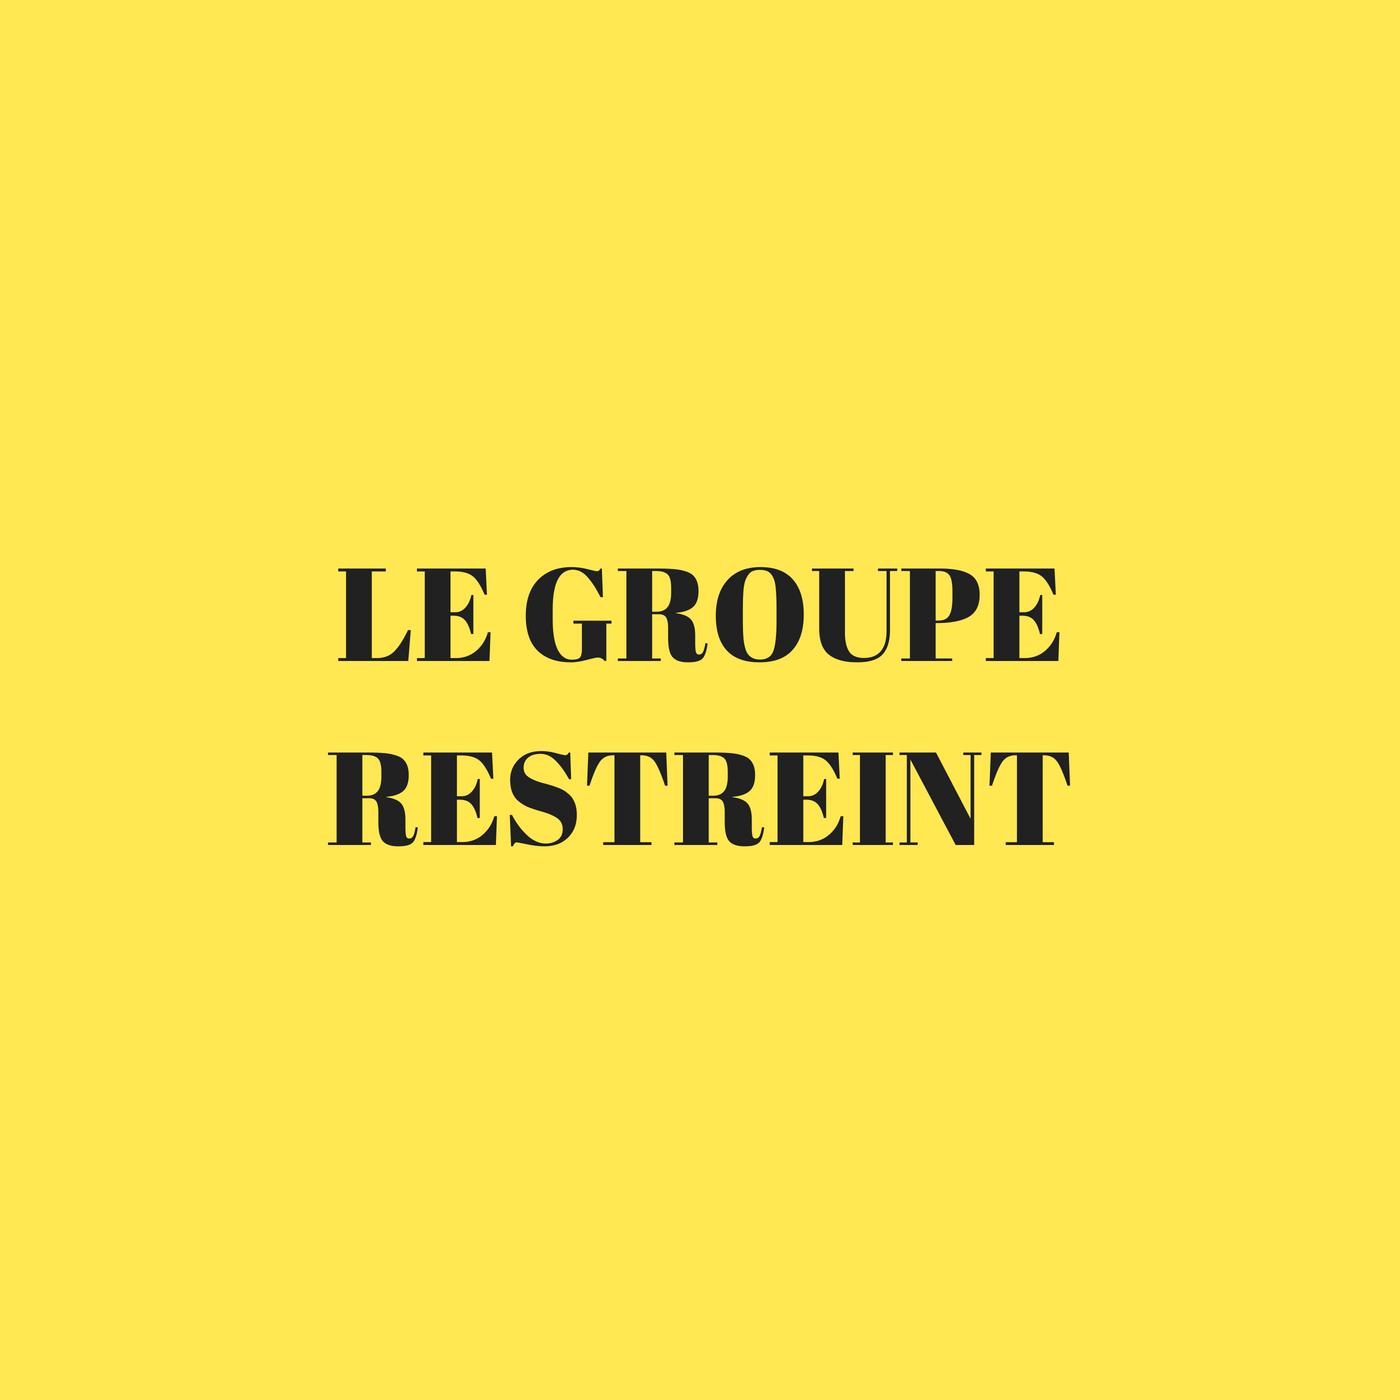 Le groupe restreint (formel, informel…)